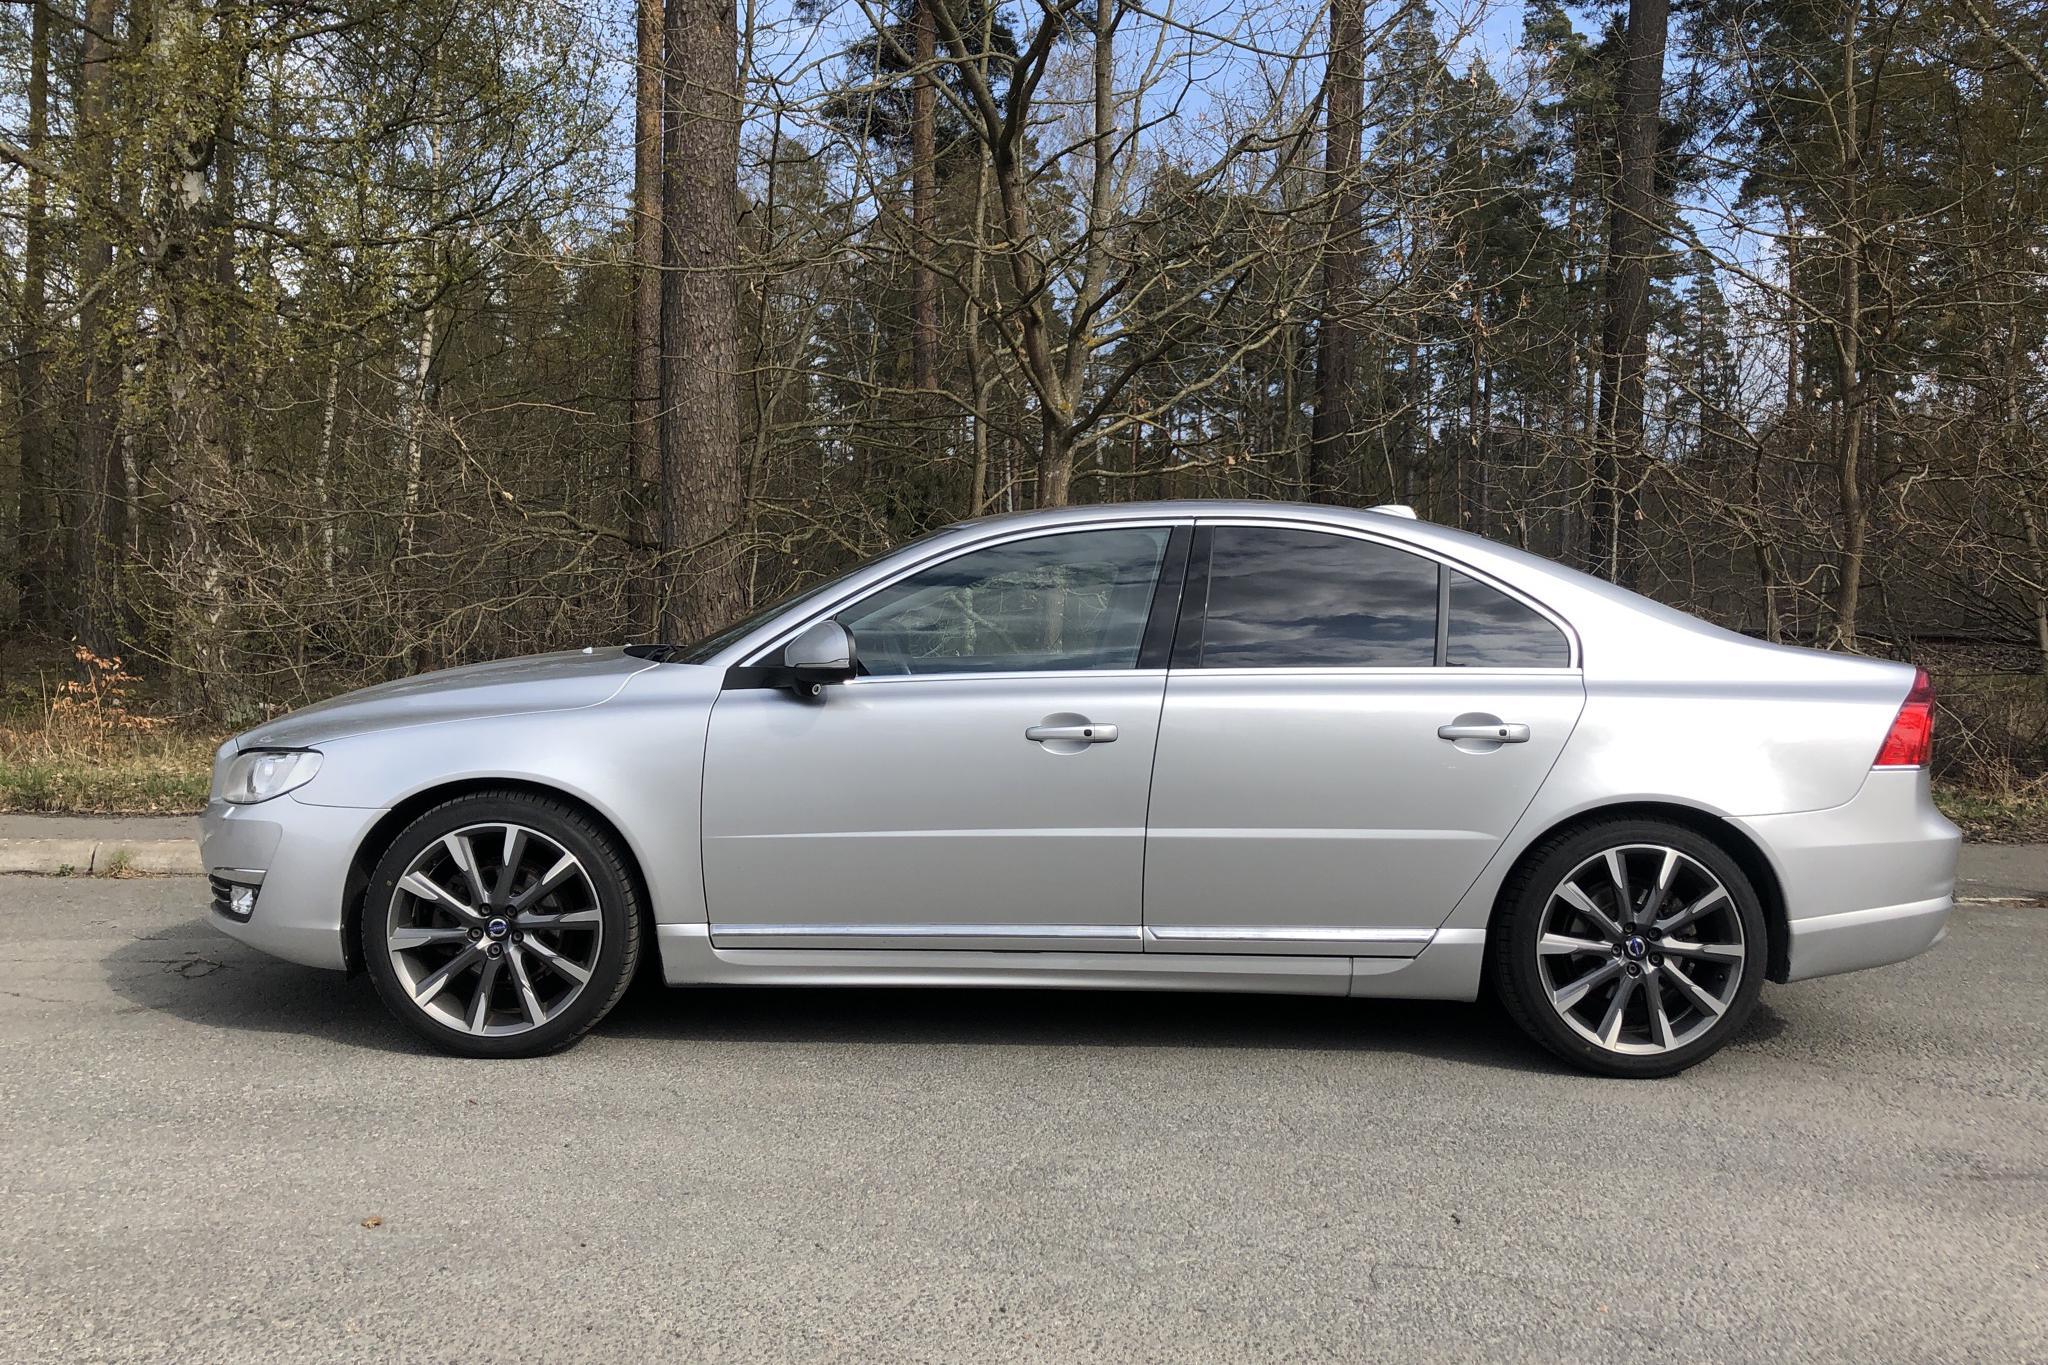 Volvo S80 D4 (181hk) - 206 300 km - Automatic - silver - 2016